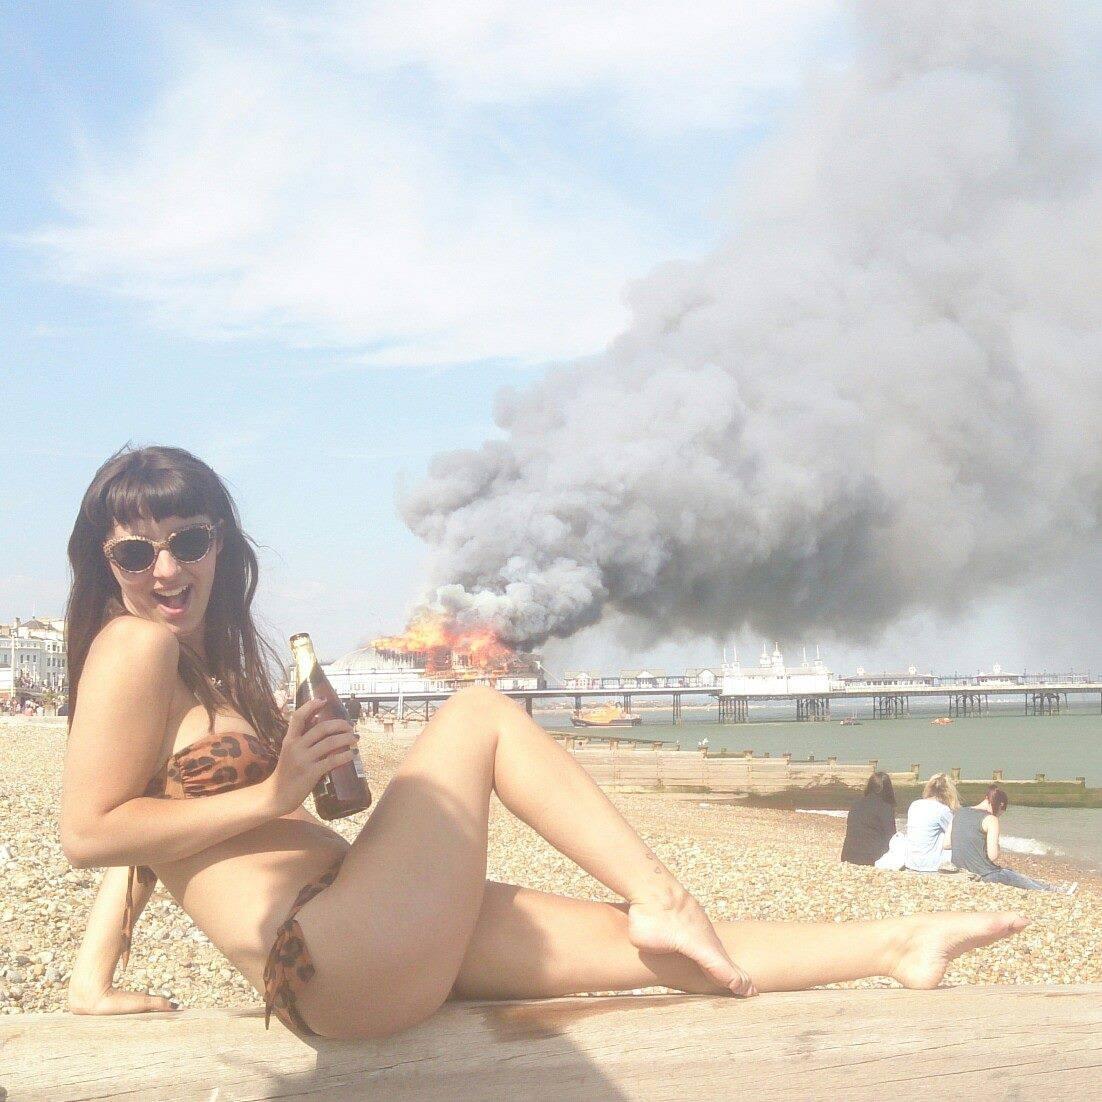 Selfie Bikini Teen A selfie: burning stuff,